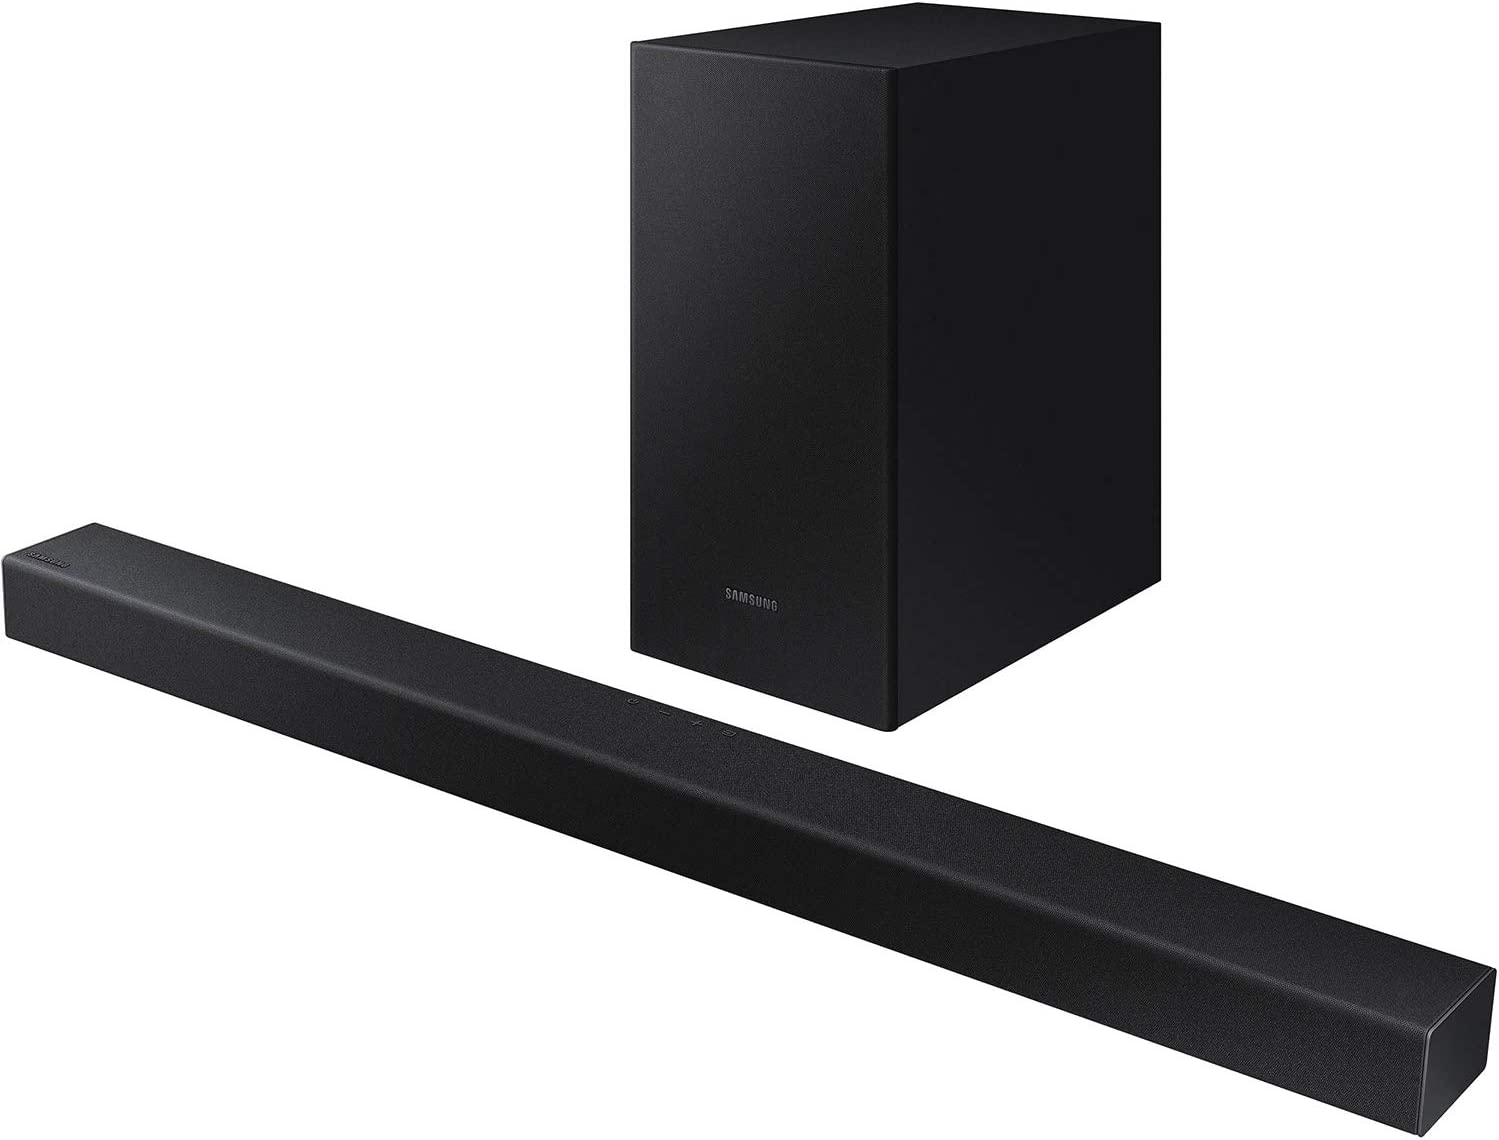 SAMSUNG HW-T450/ZP 200-Watt 2.1 Channel Soundbar System with Wireless Subwoofer